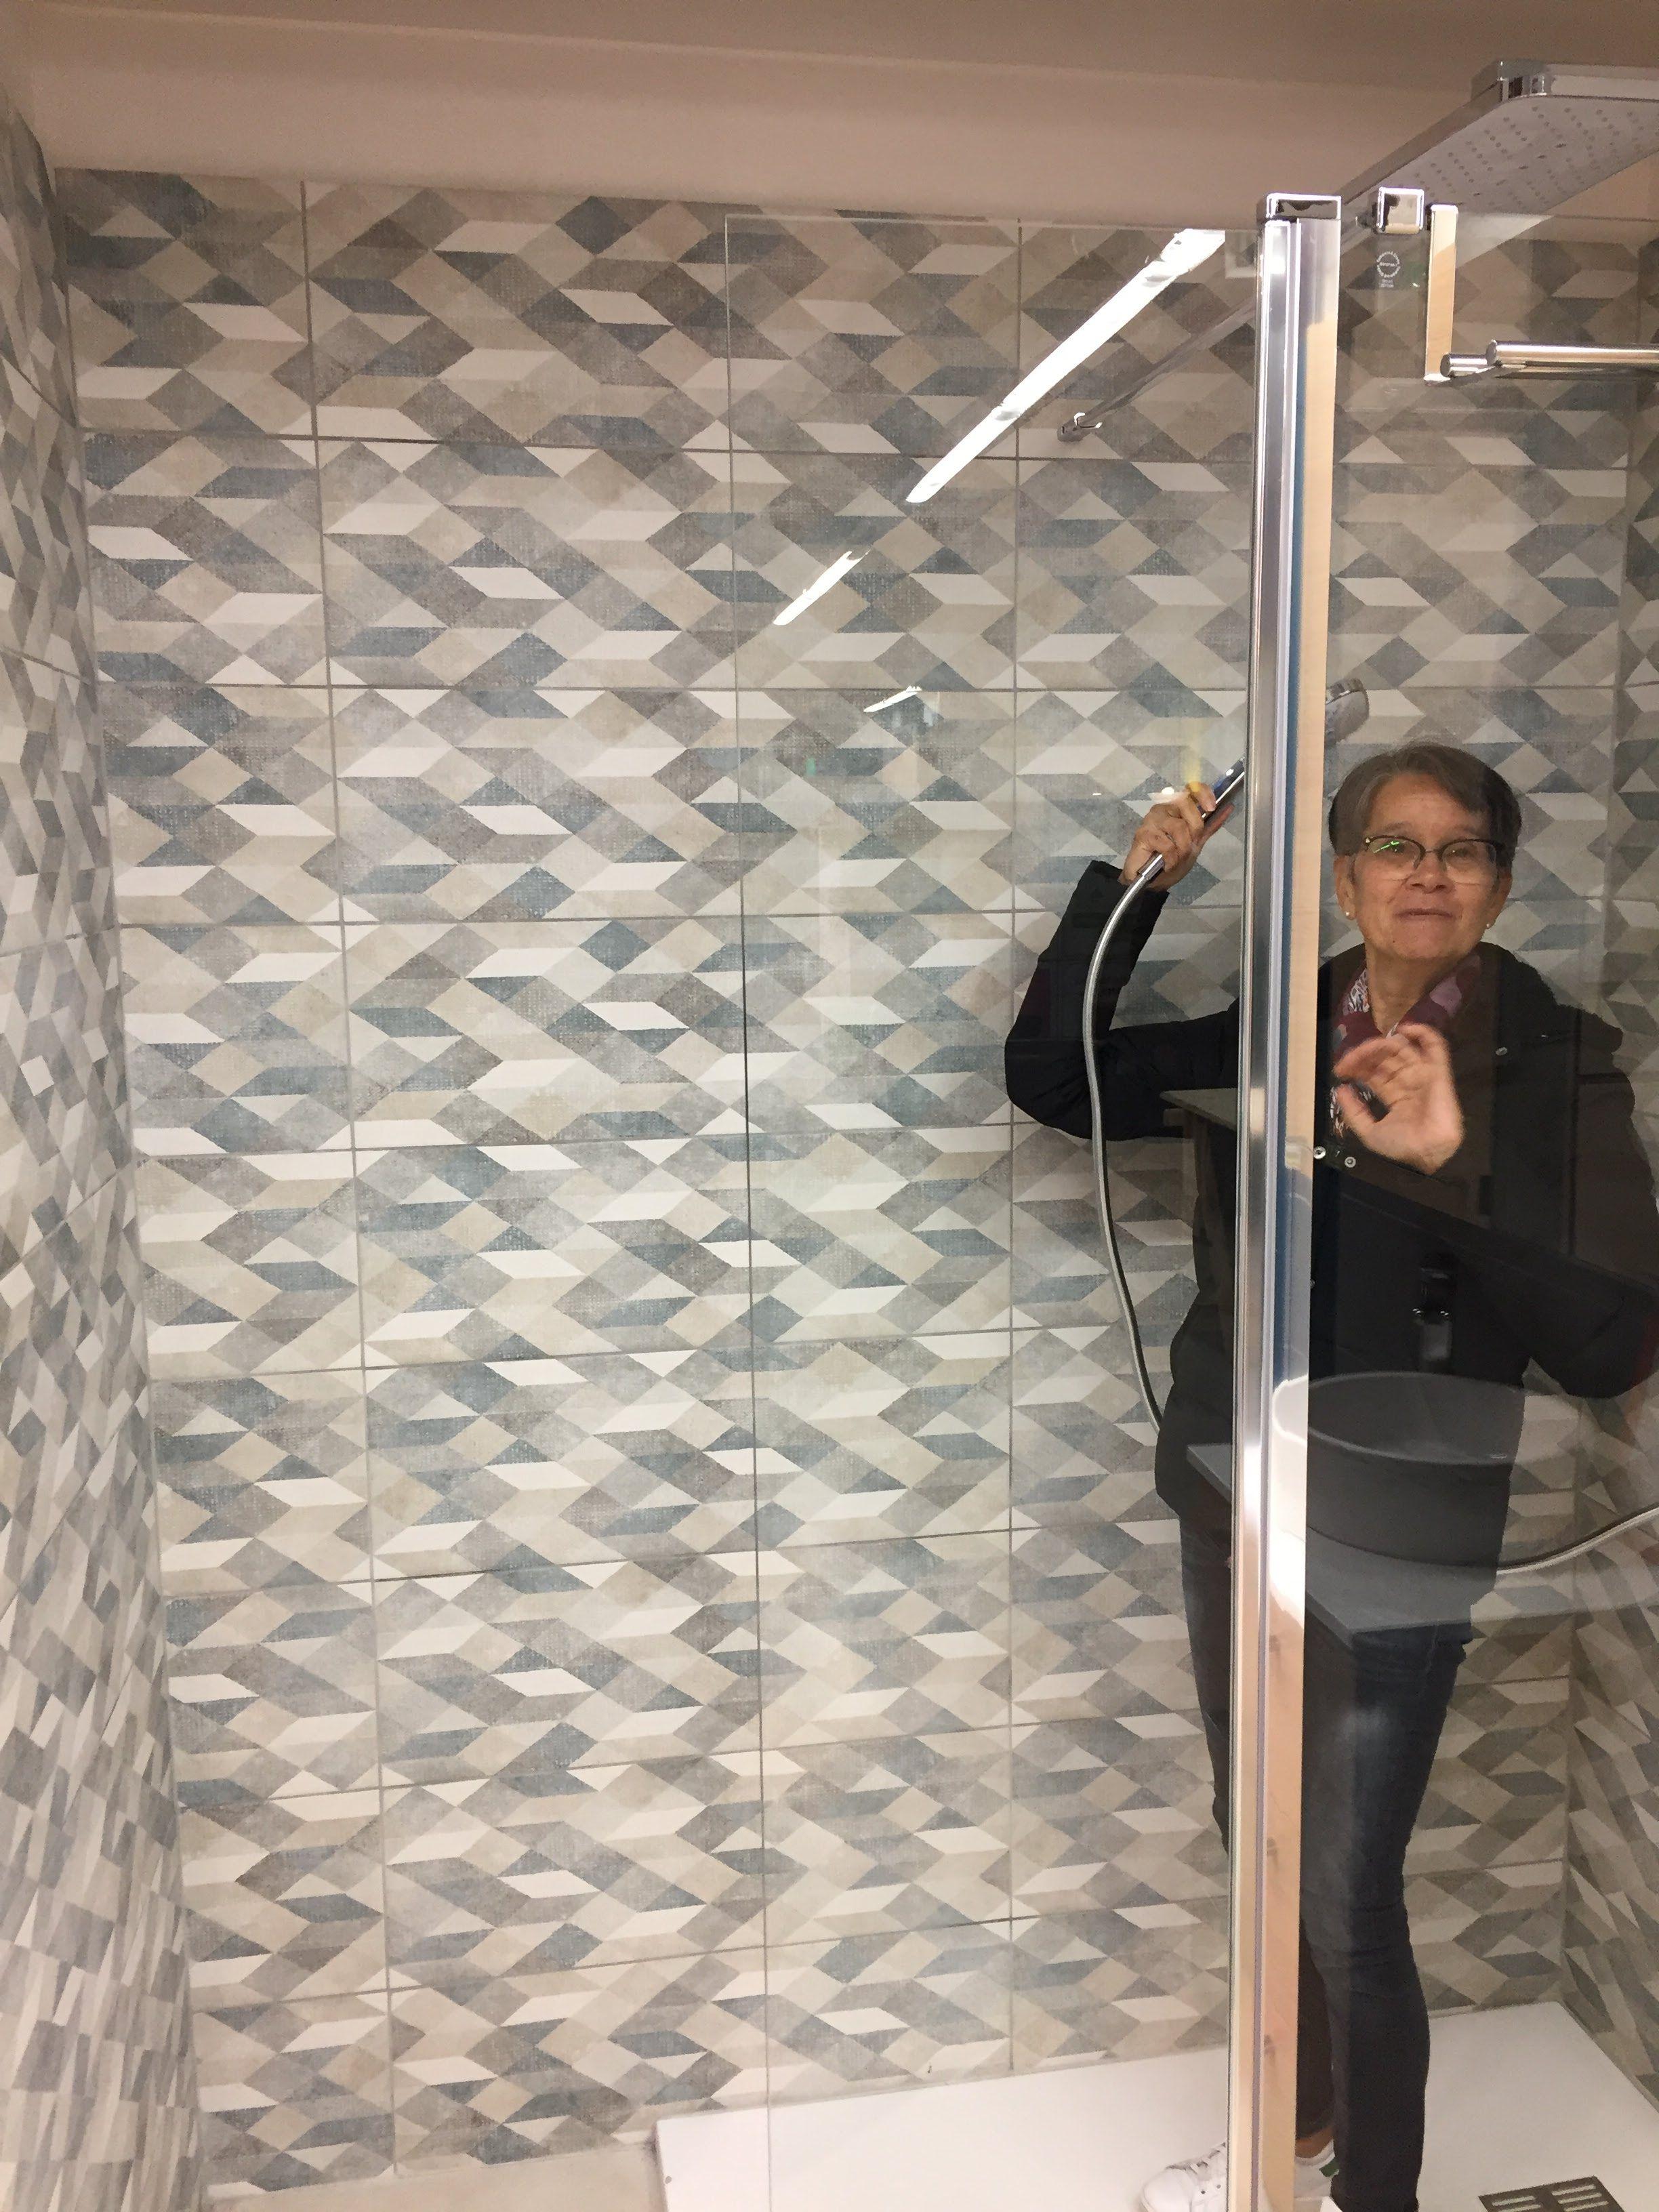 Carrelage Mural Leroy Merlin Moodboard Mood Boards Mirror Selfie